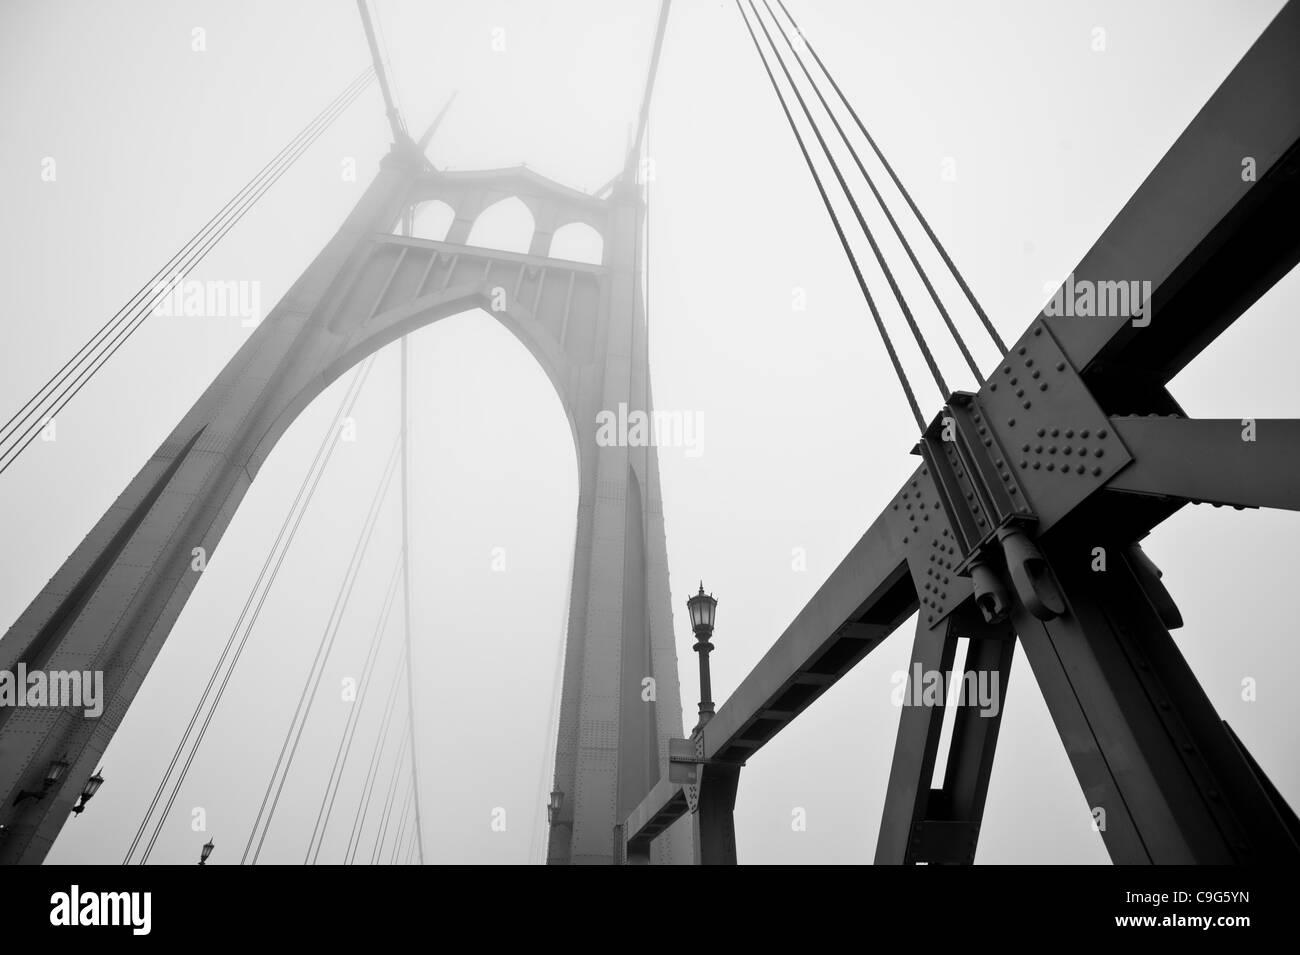 Dec. 6, 2011 - Portland, Oregon, United States - Dense fog envelopes the St. Johns Bridge in Portland, Oregon. (Credit Image: © Jim Z. Rider/ZUMAPRESS.com) Stock Photo